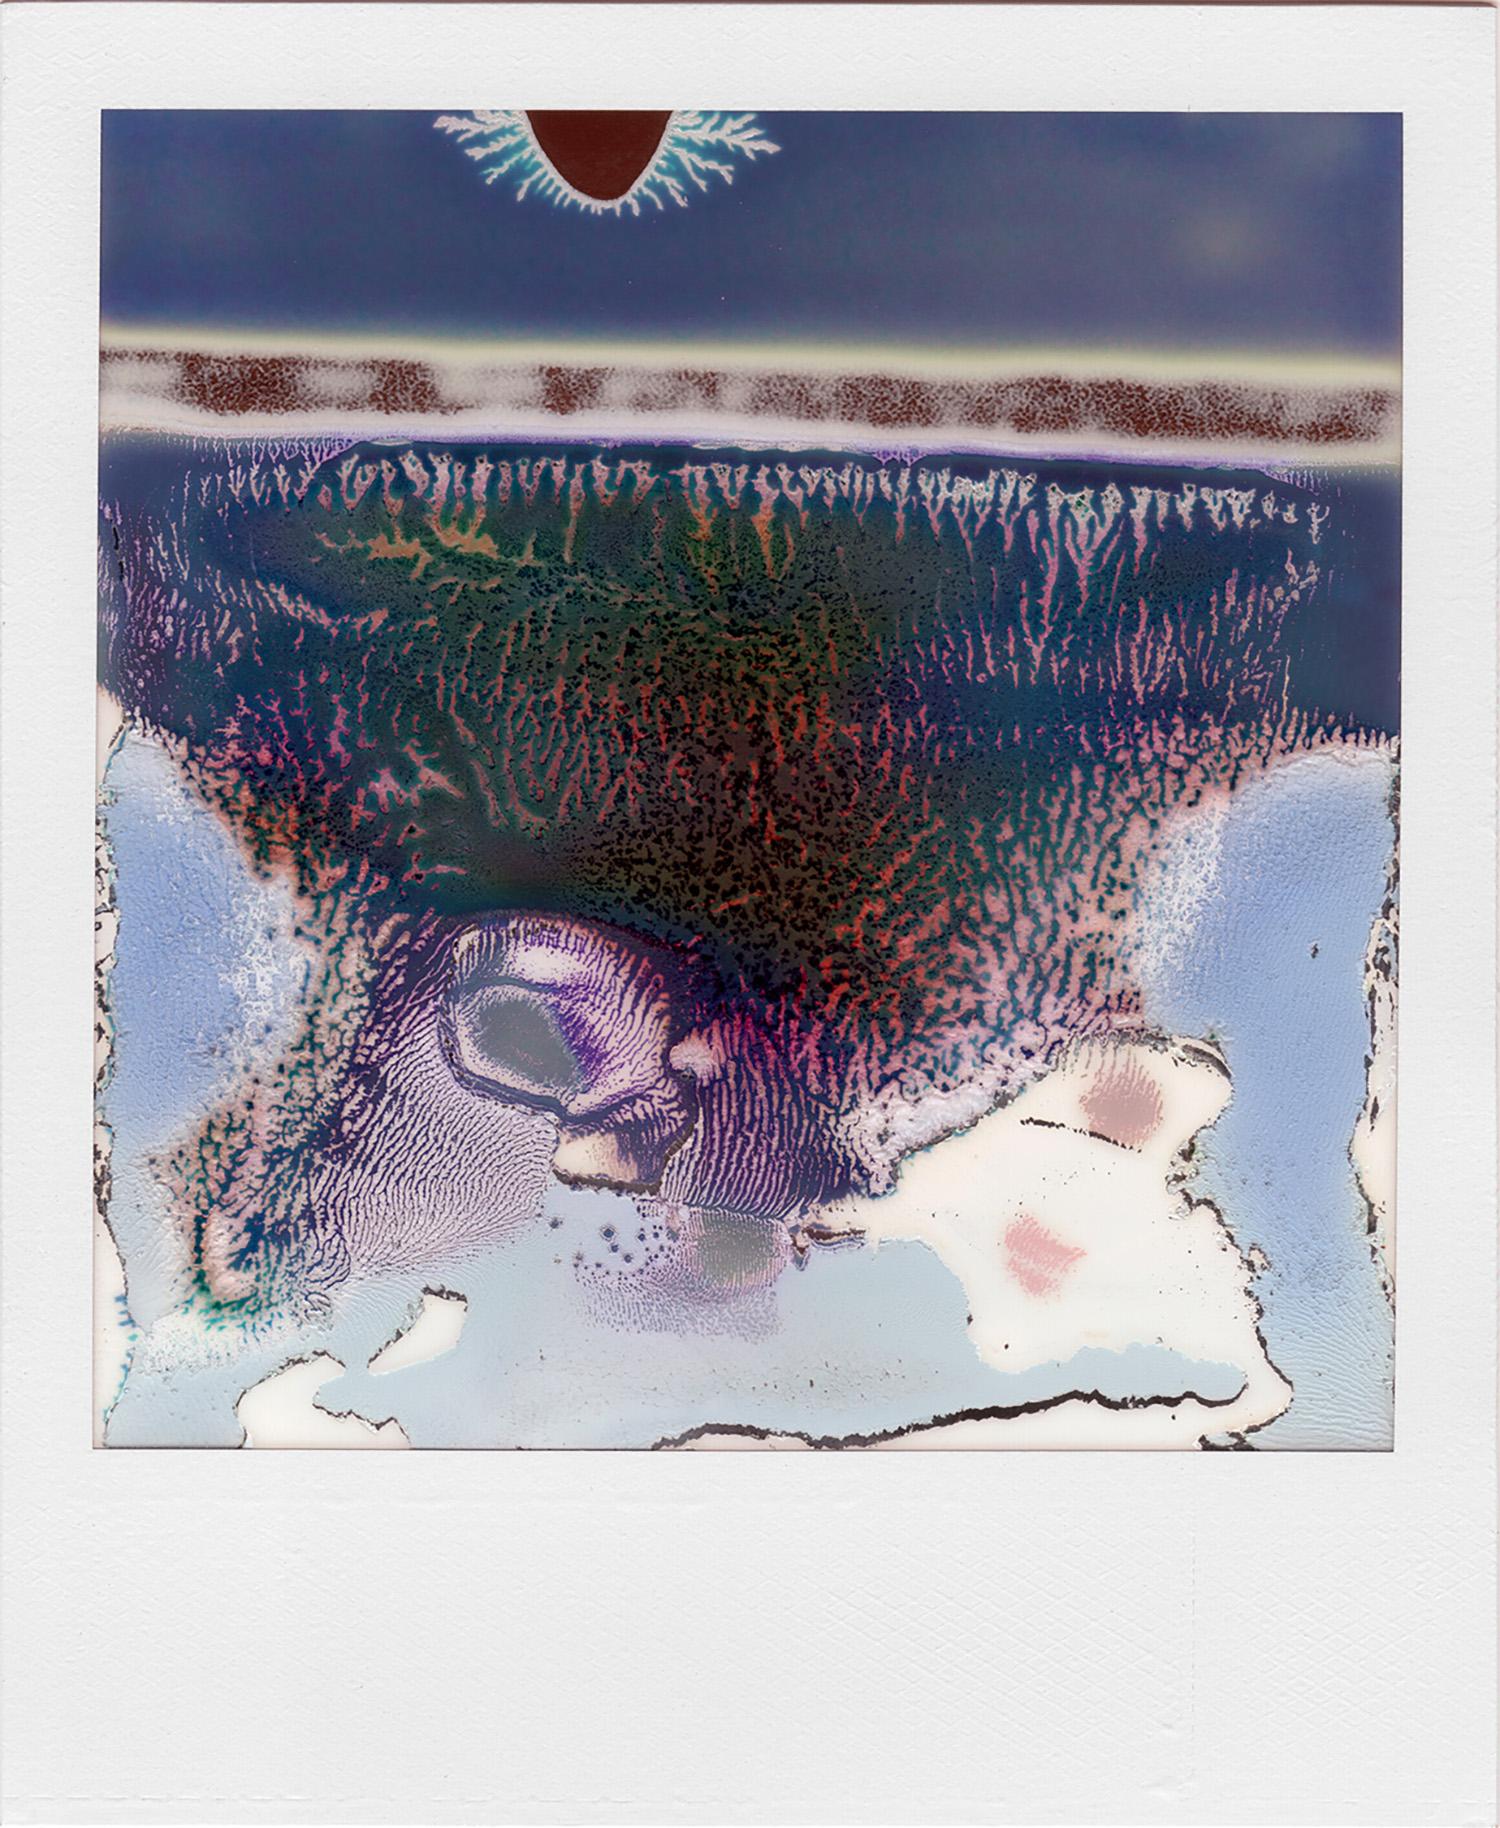 Ruined Polaroid #14, 2011